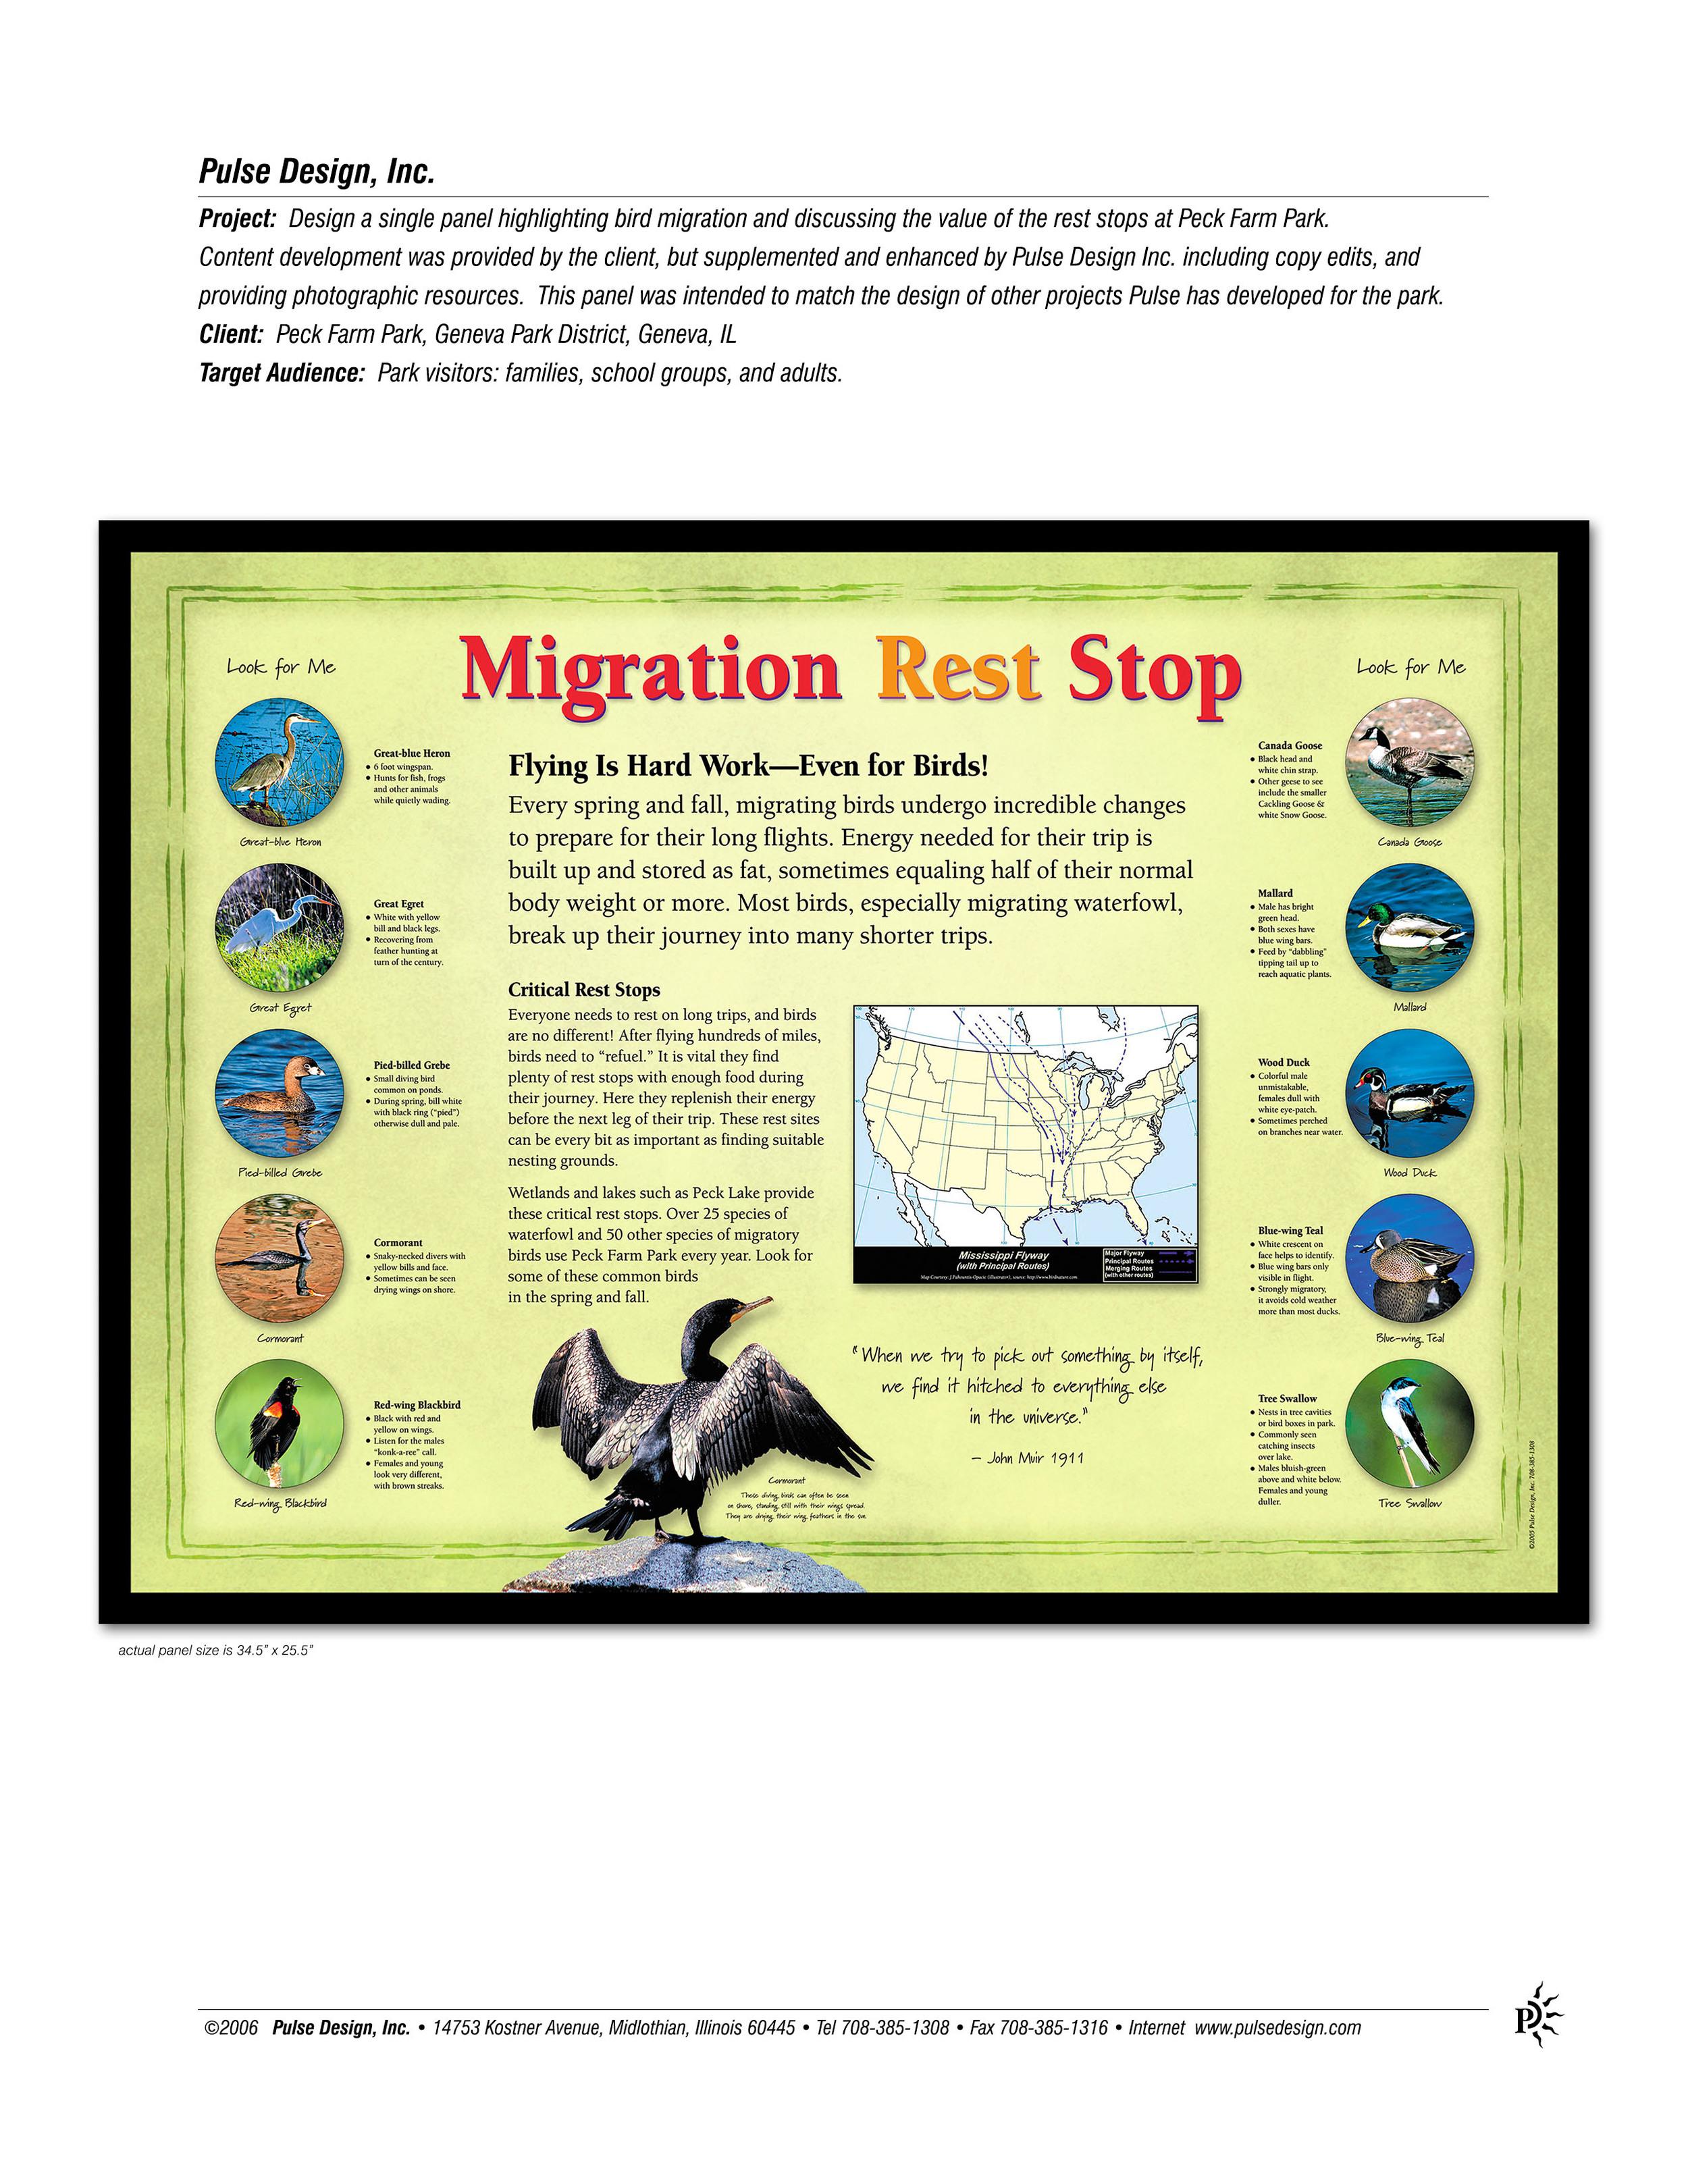 Peck-Farm-Park-Migration-Sign-Pulse-Design-Inc.jpg